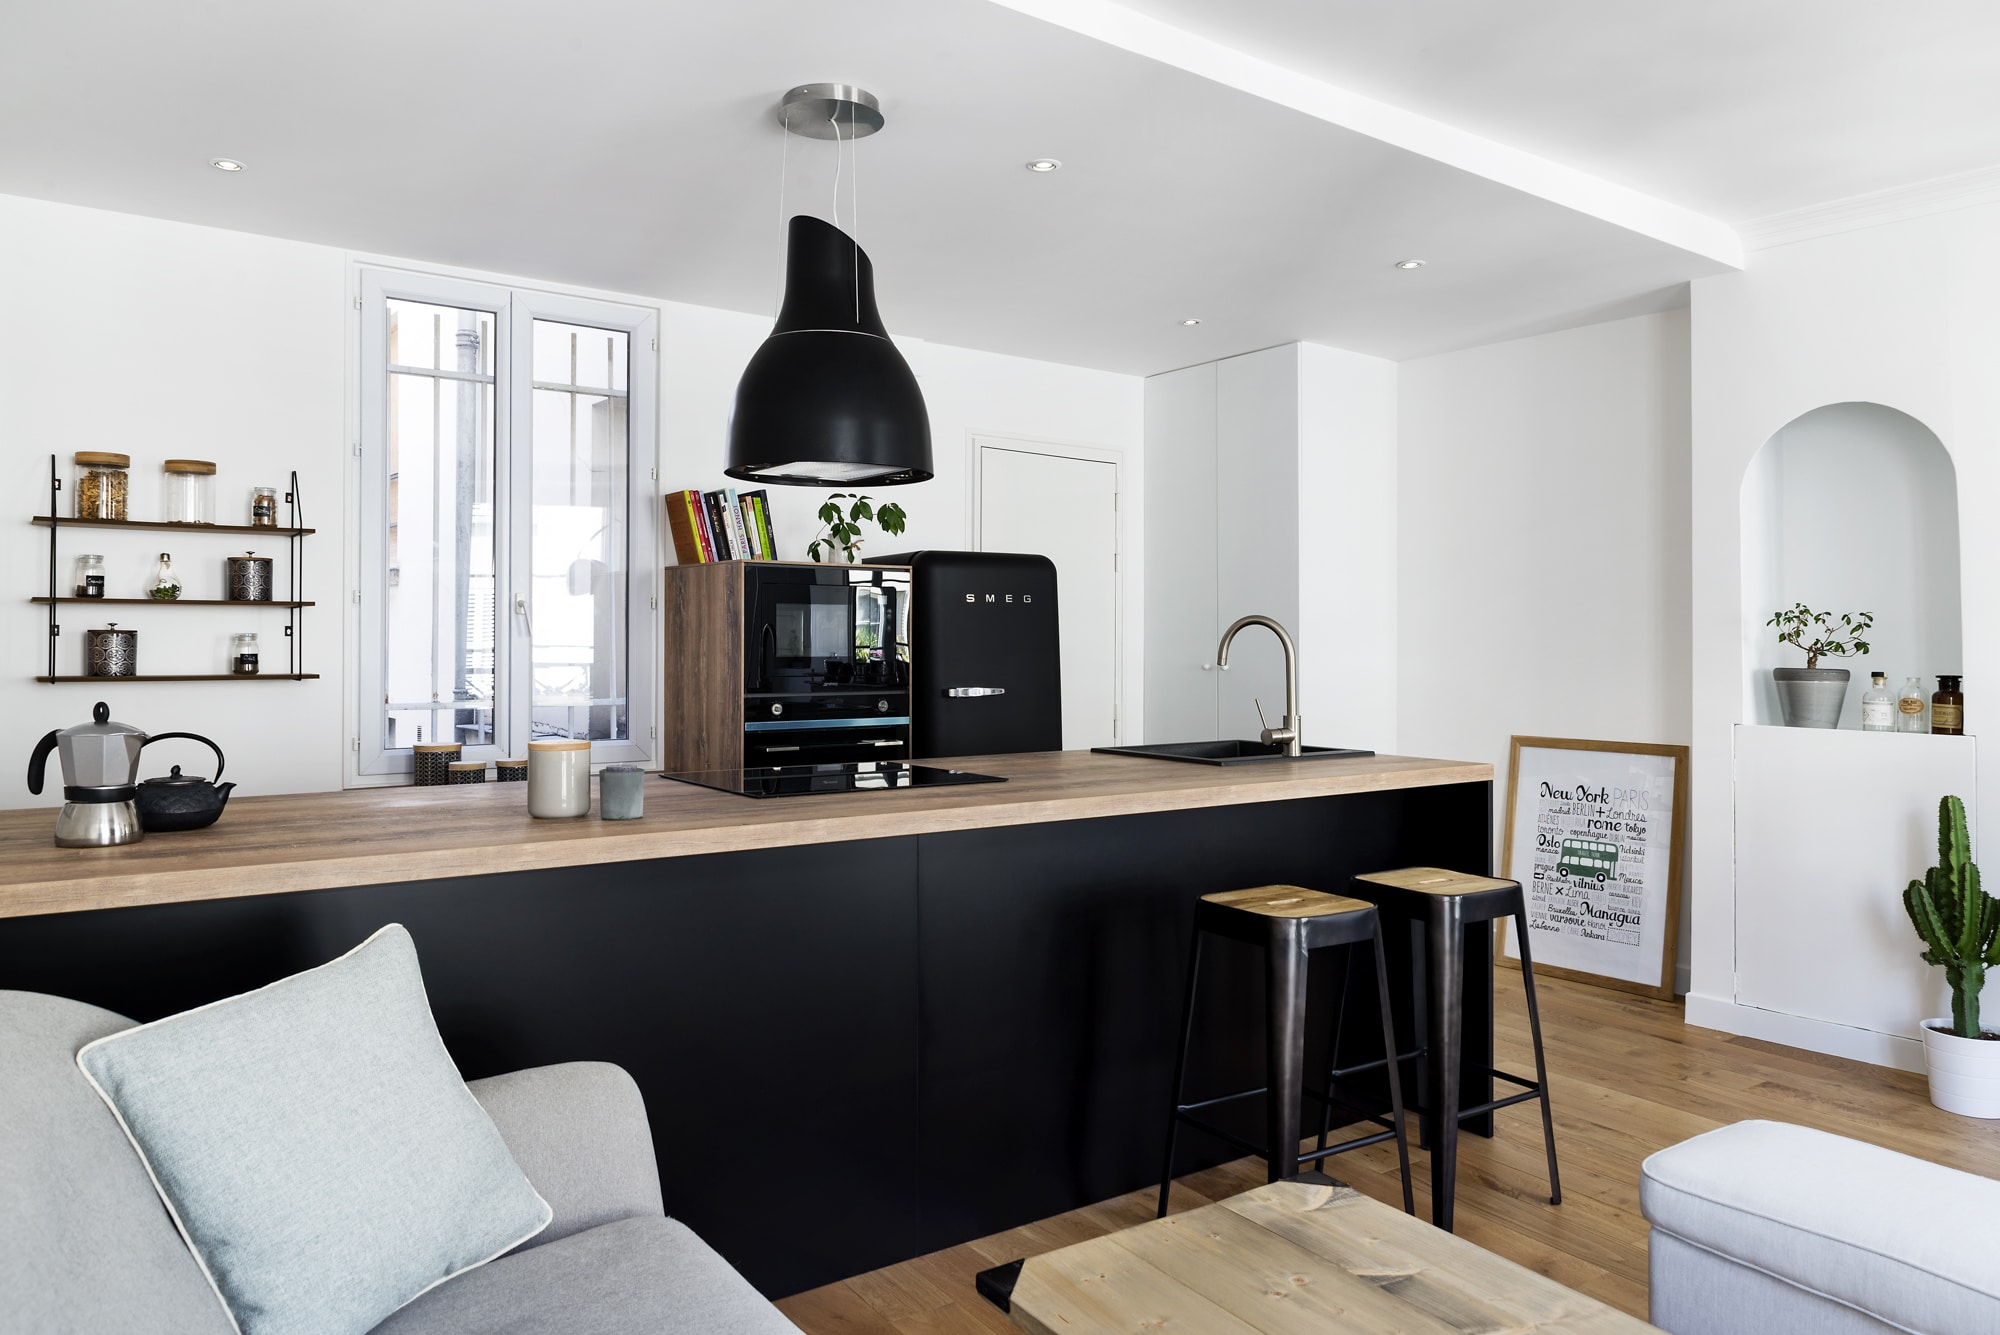 jem sweethomew 8724 sweet home paris. Black Bedroom Furniture Sets. Home Design Ideas